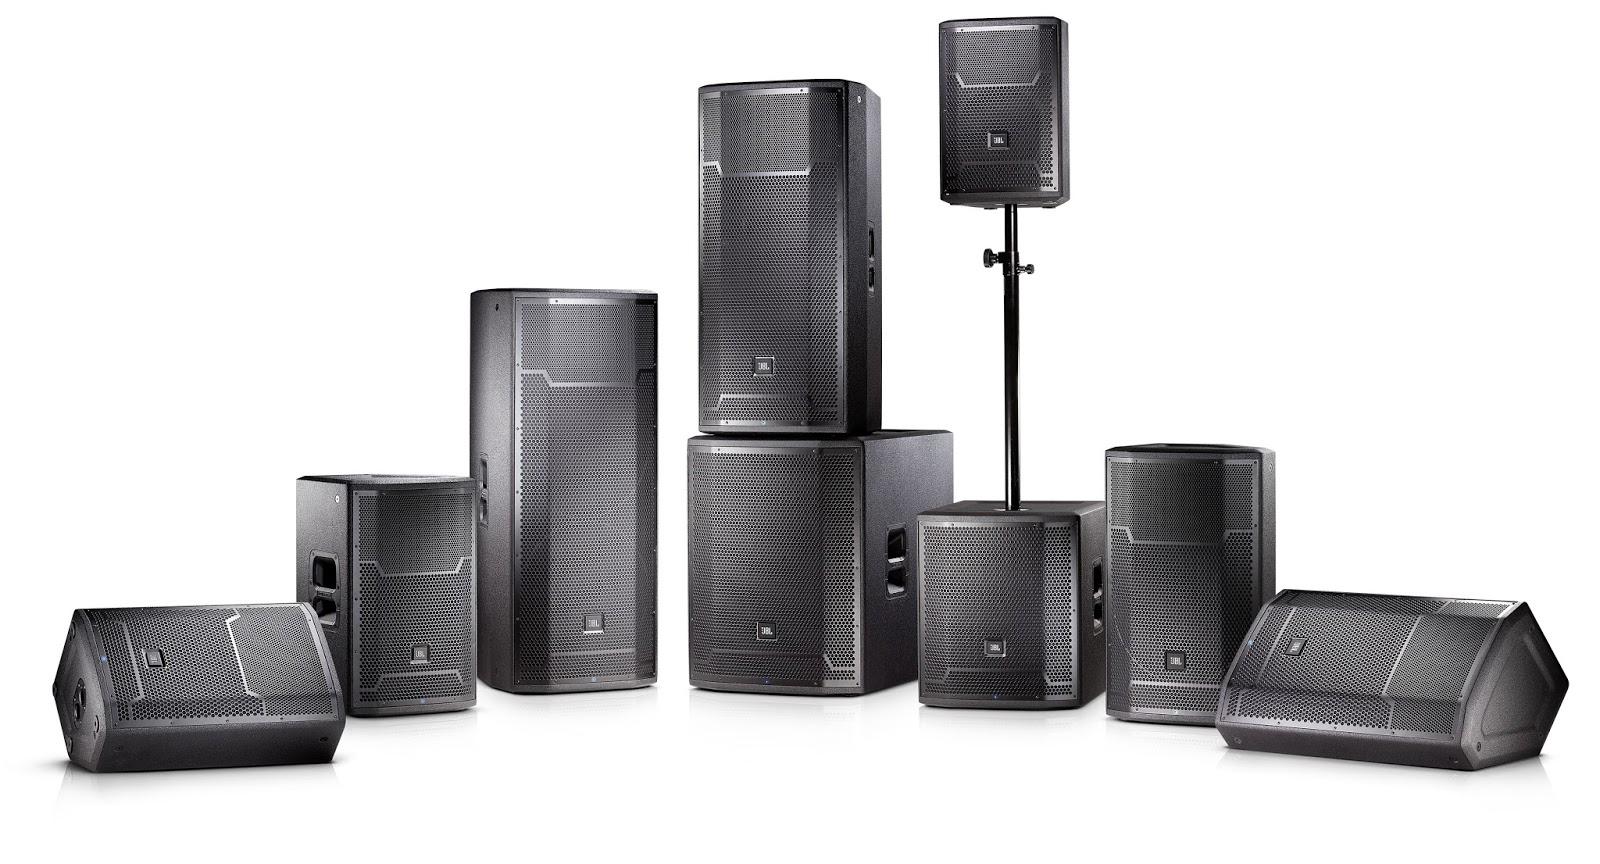 harman s jbl professional prx700 series redefines premium. Black Bedroom Furniture Sets. Home Design Ideas